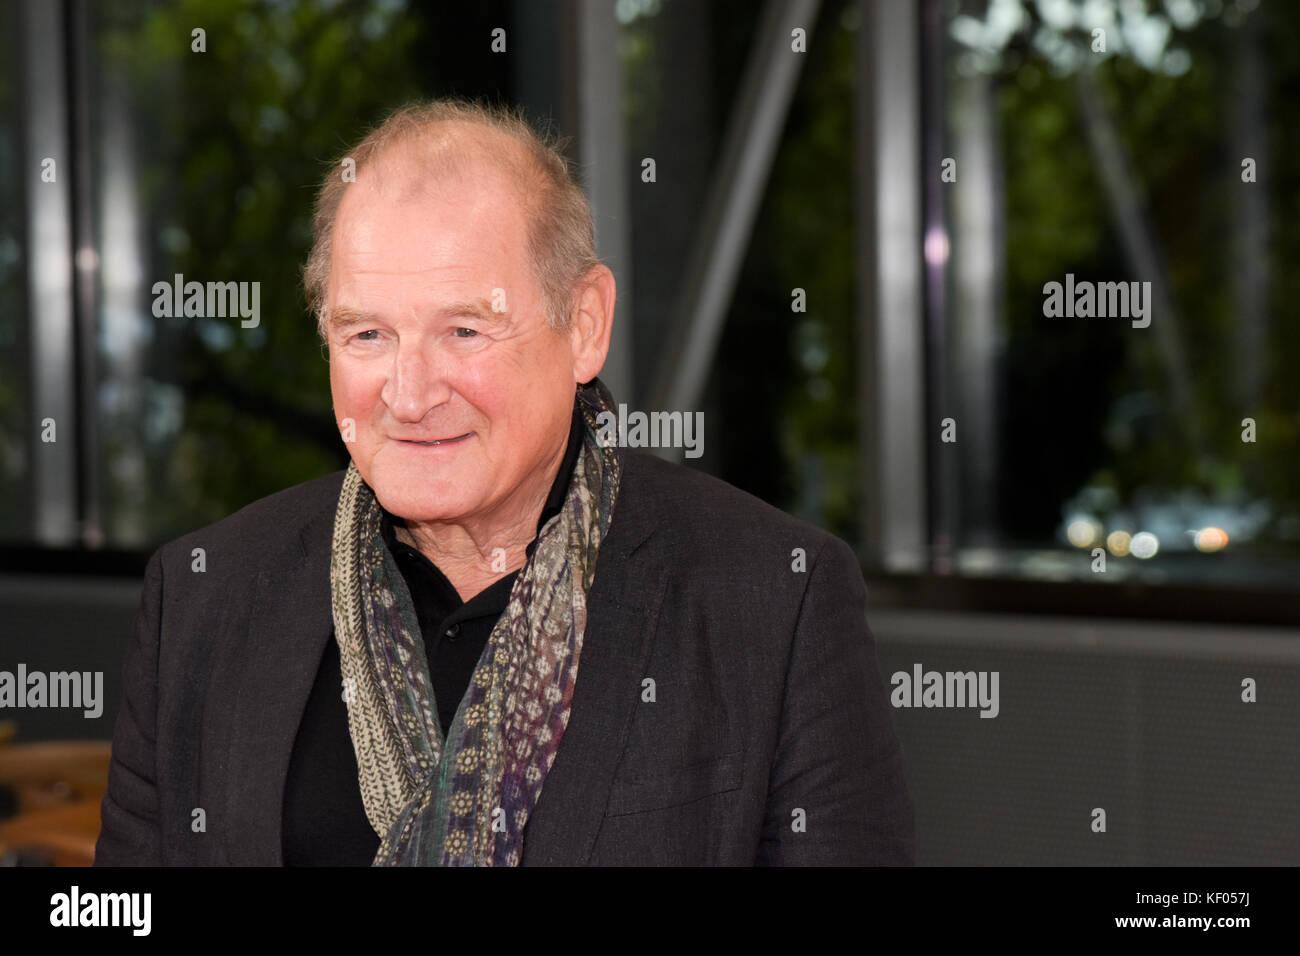 Frankfurt am Main, Deutschland. 10 Okt, 2017. Burghart Klaussner (* 1949), deutscher Schauspieler, Synchronsprecher Stockbild